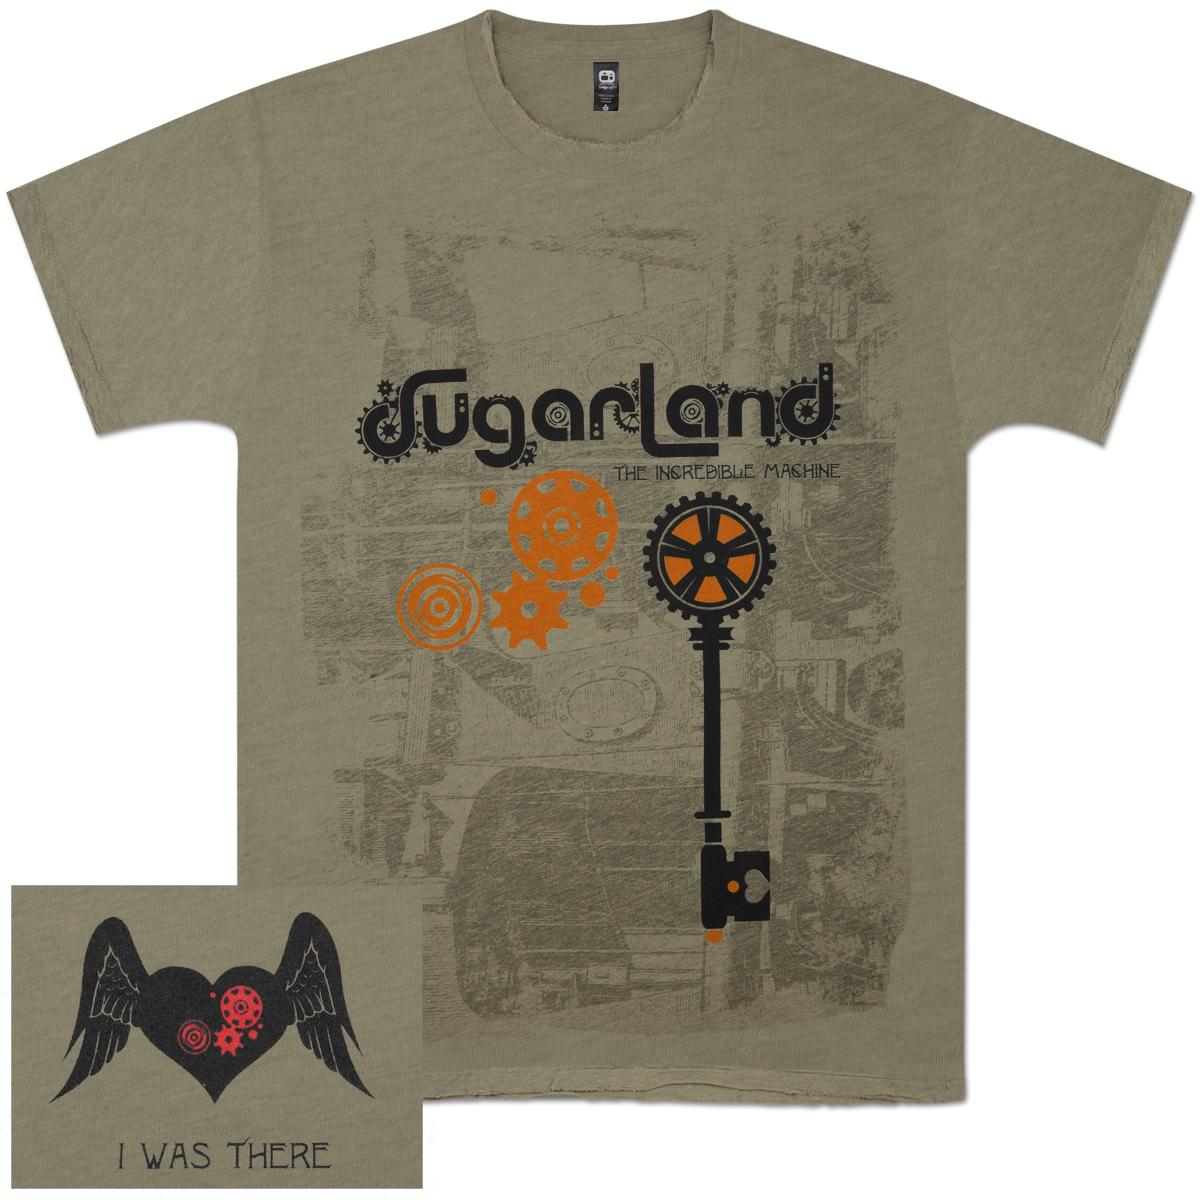 Sugarland Incredible Machine T-Shirt